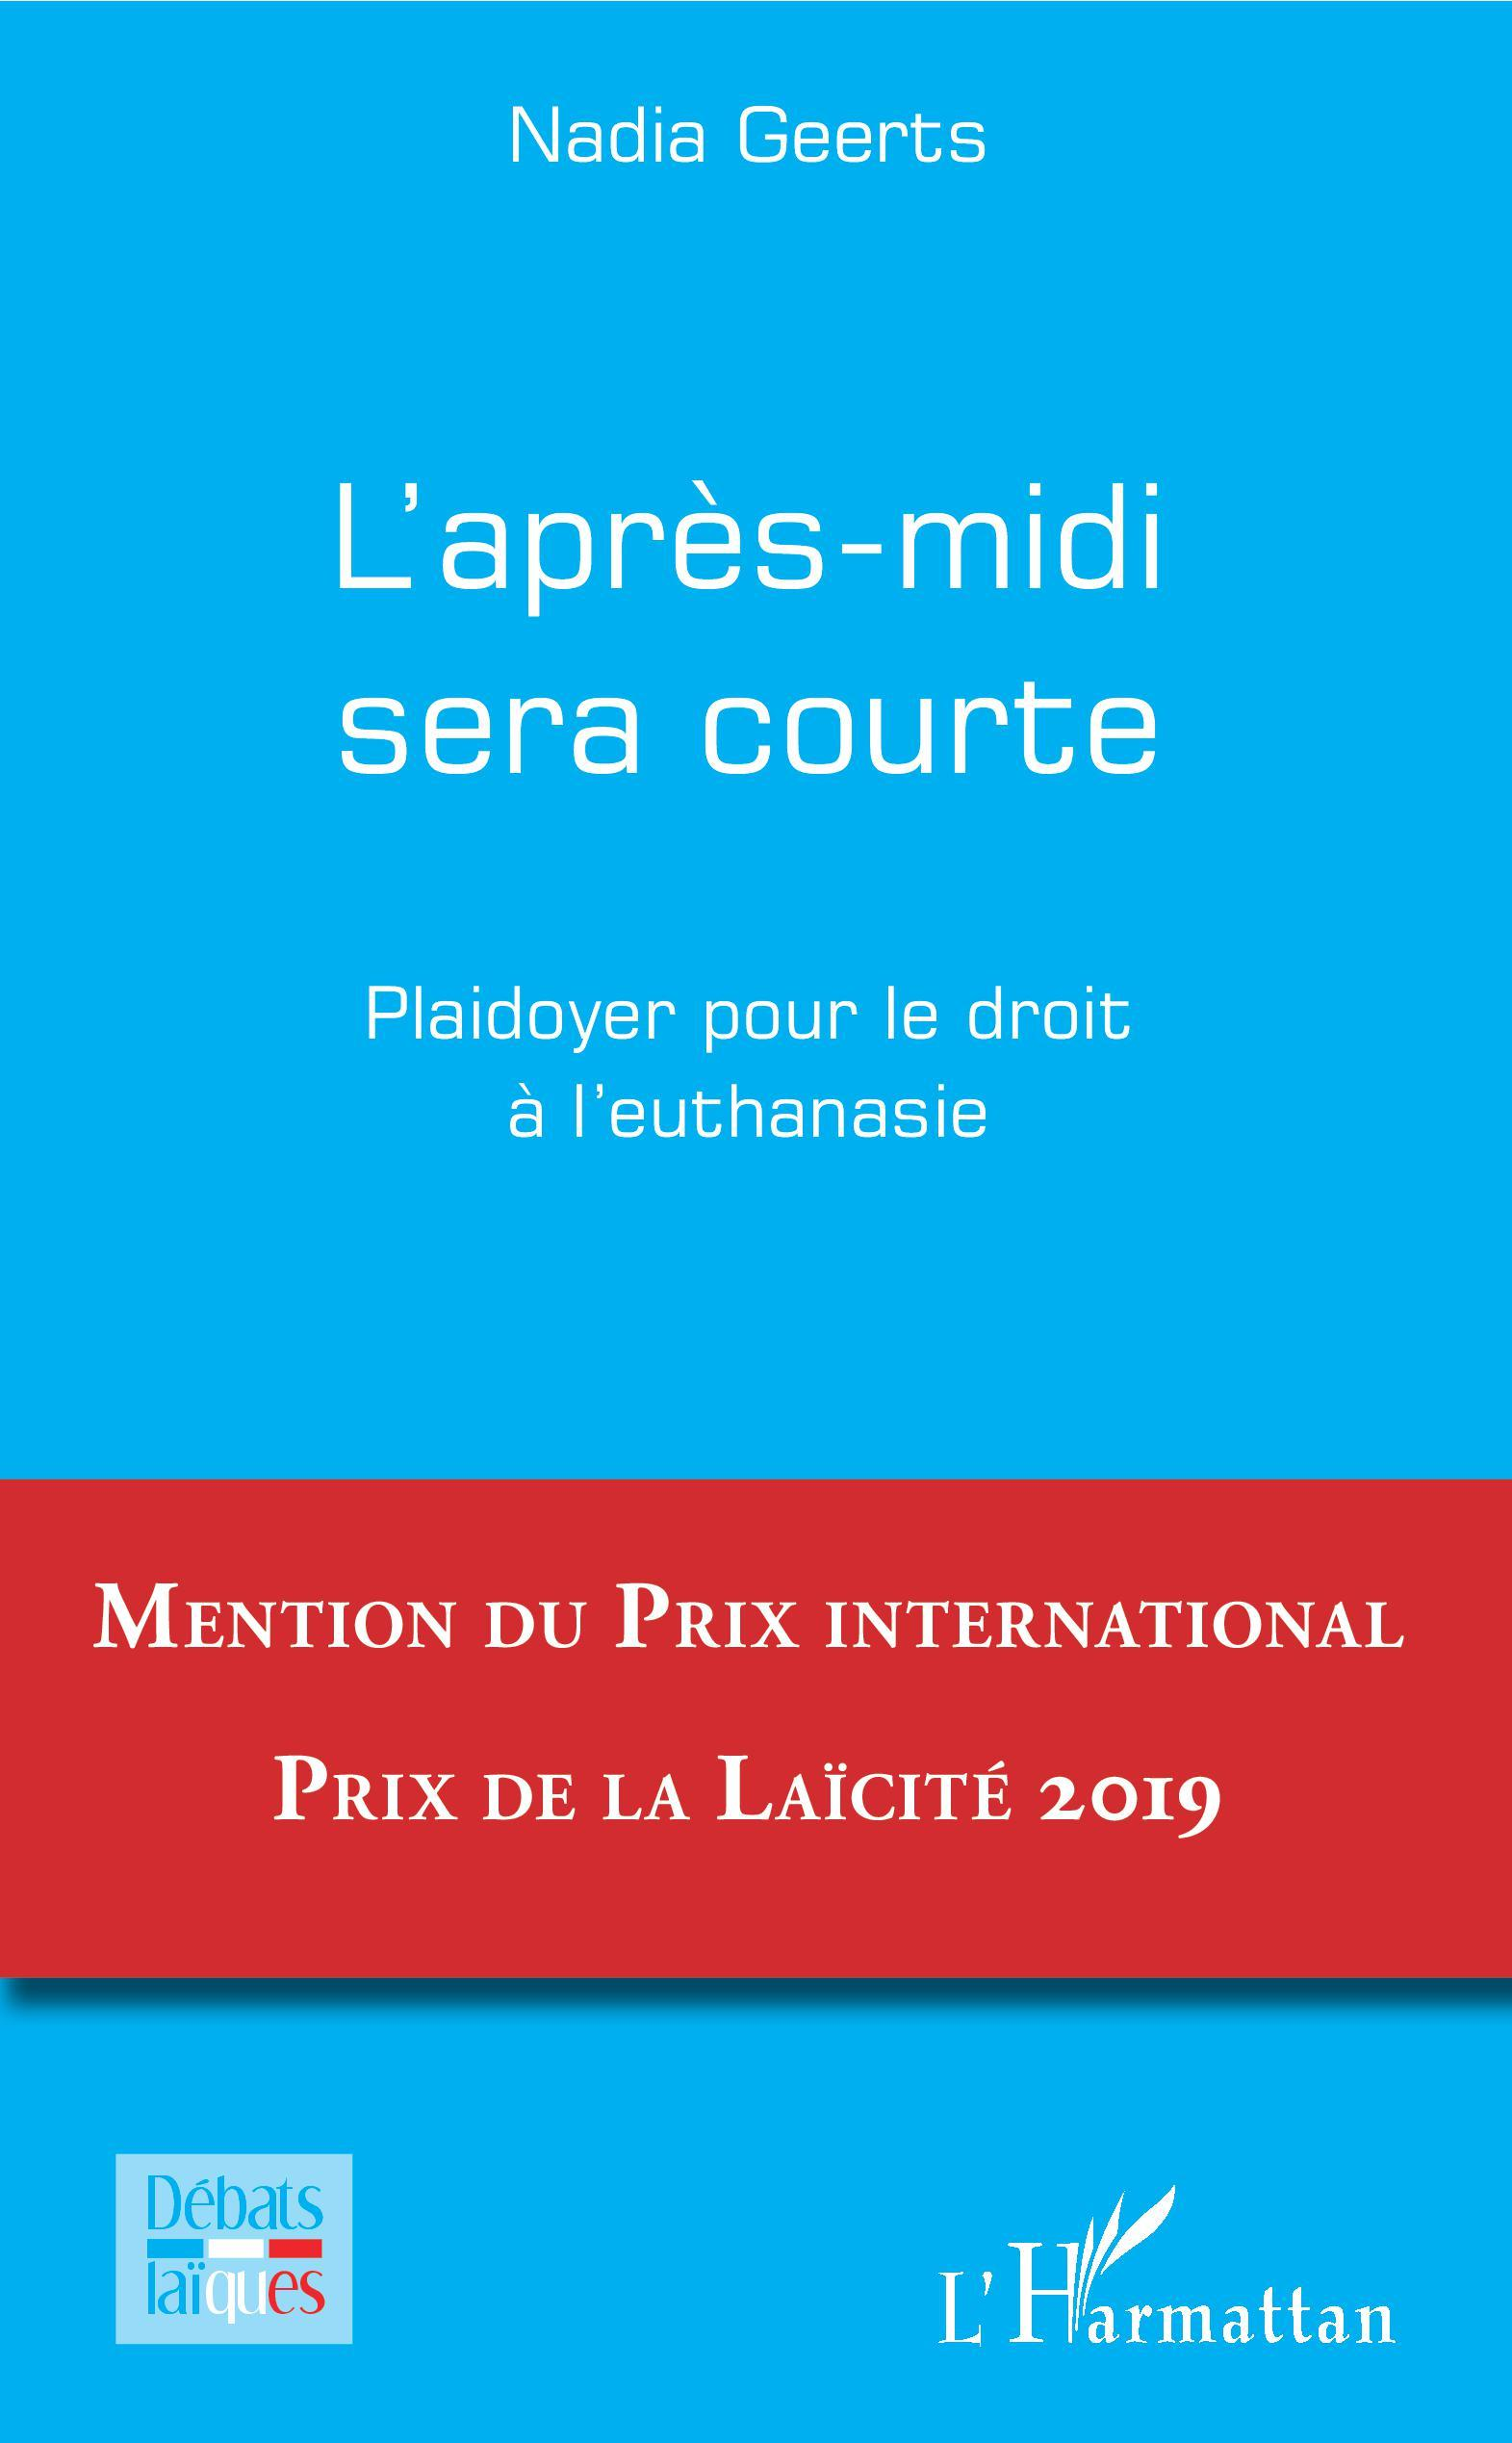 L'APRES-MIDI SERA COURTE - PLAIDOYER POUR LE DROIT A L'EUTHANASIE